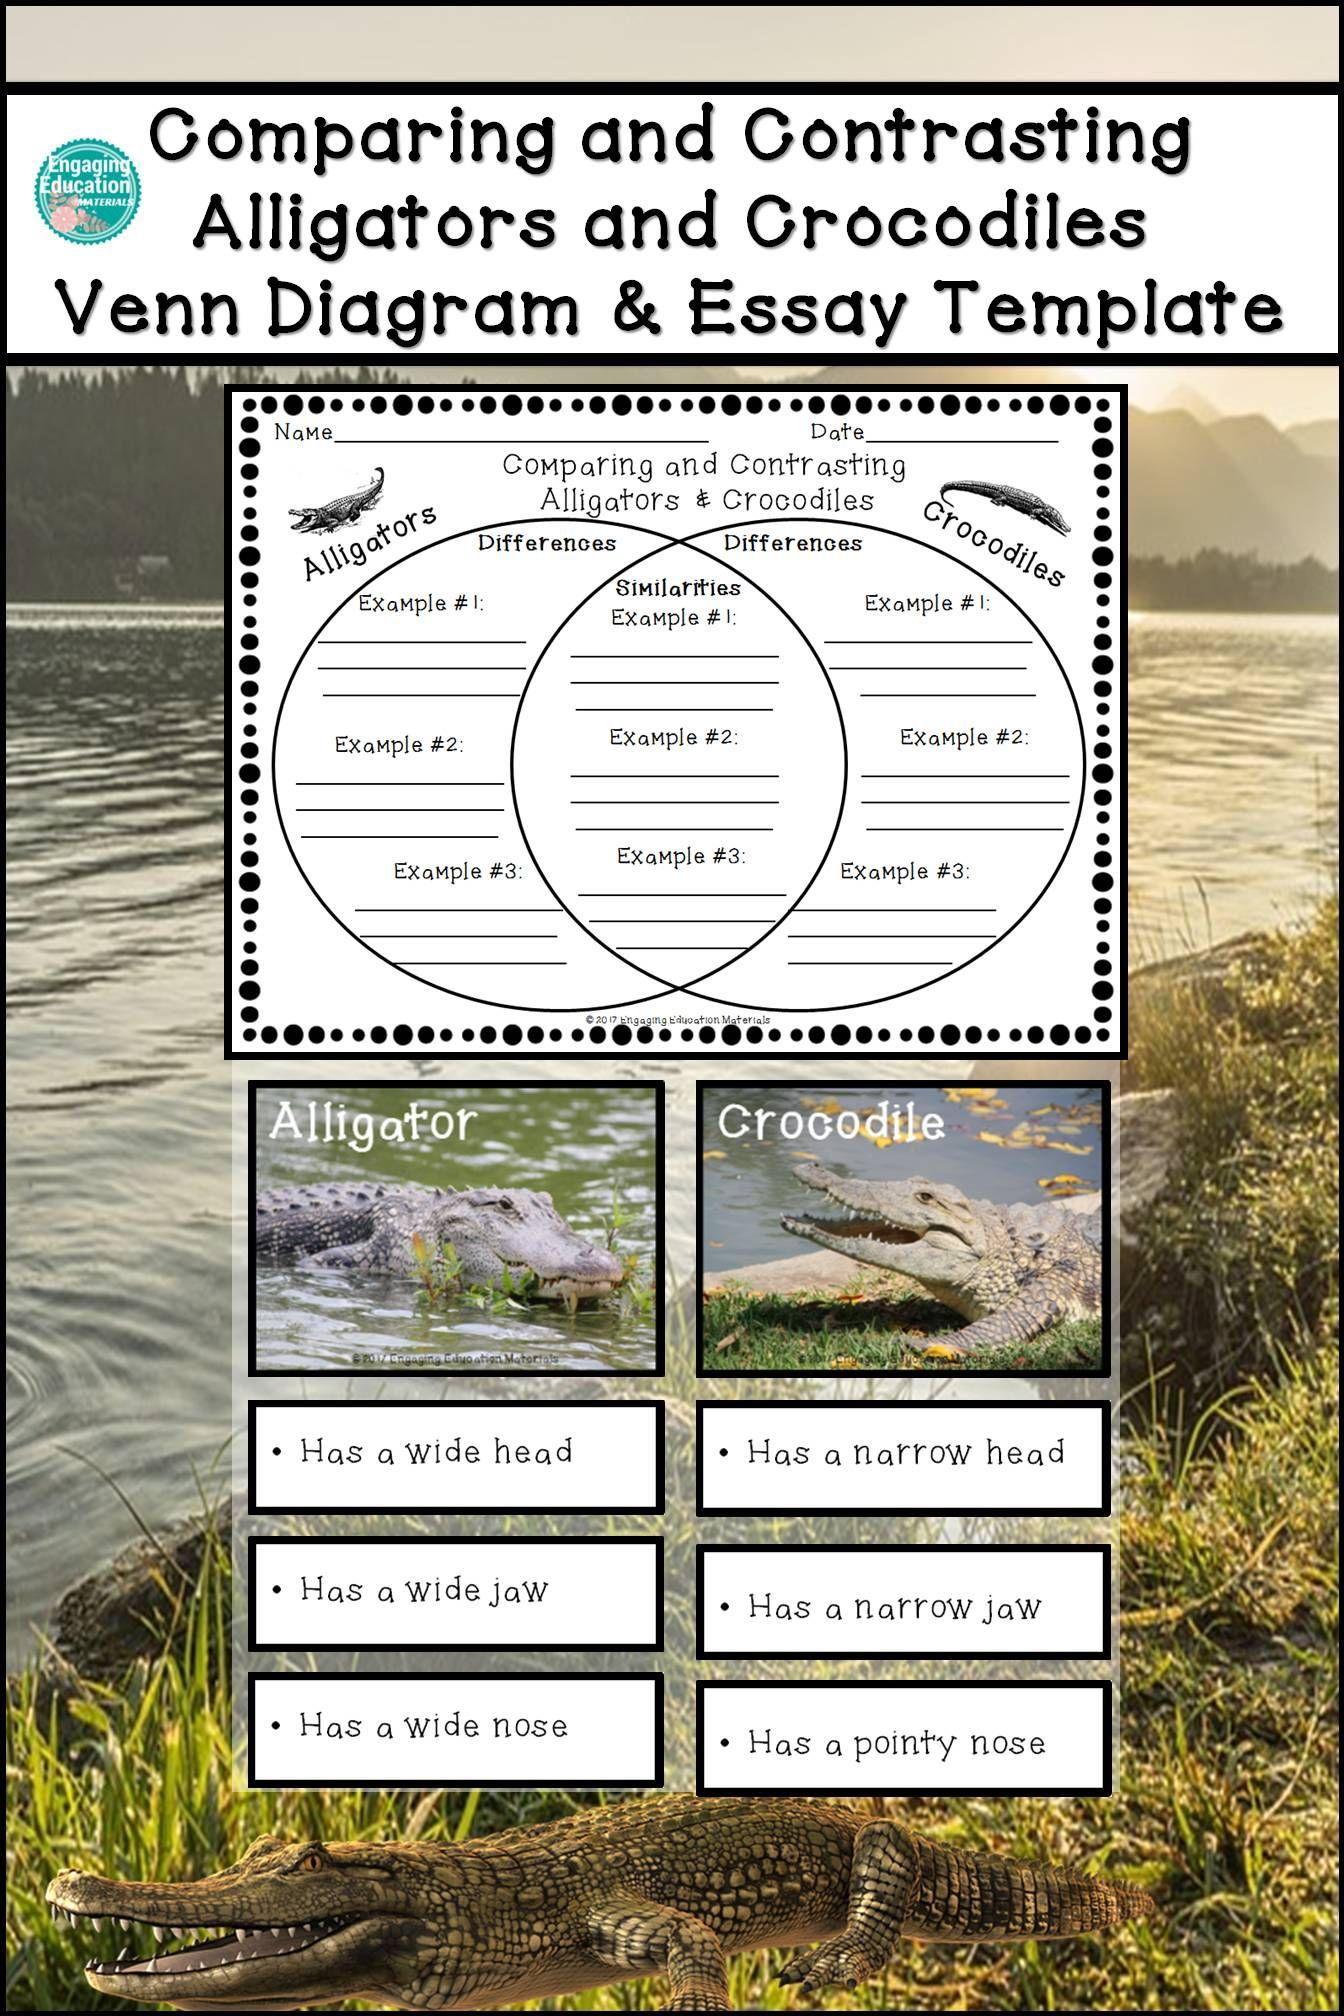 Venn Diagram Of Reptiles And Amphibians Regulator Wiring Comparing Contrasting Alligators Crocodiles